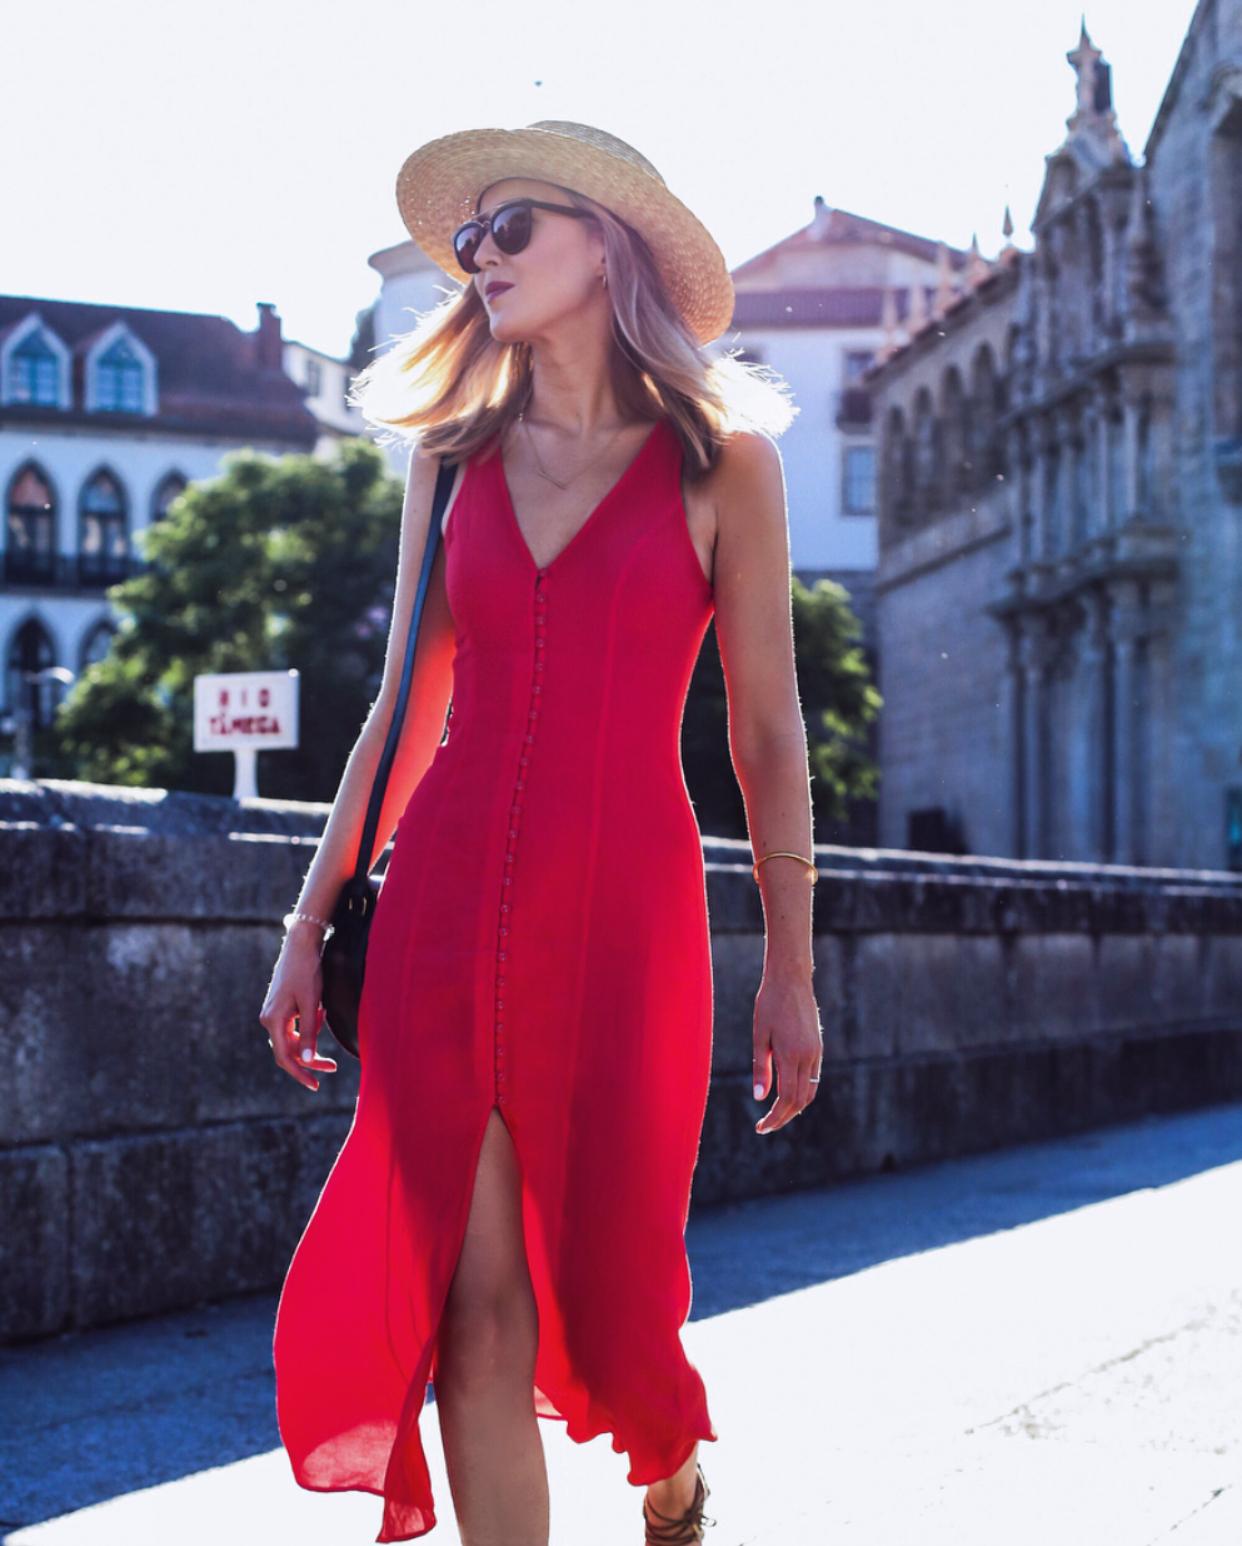 red-linen-midi-dress-boater-hat-in-amarante-portugal